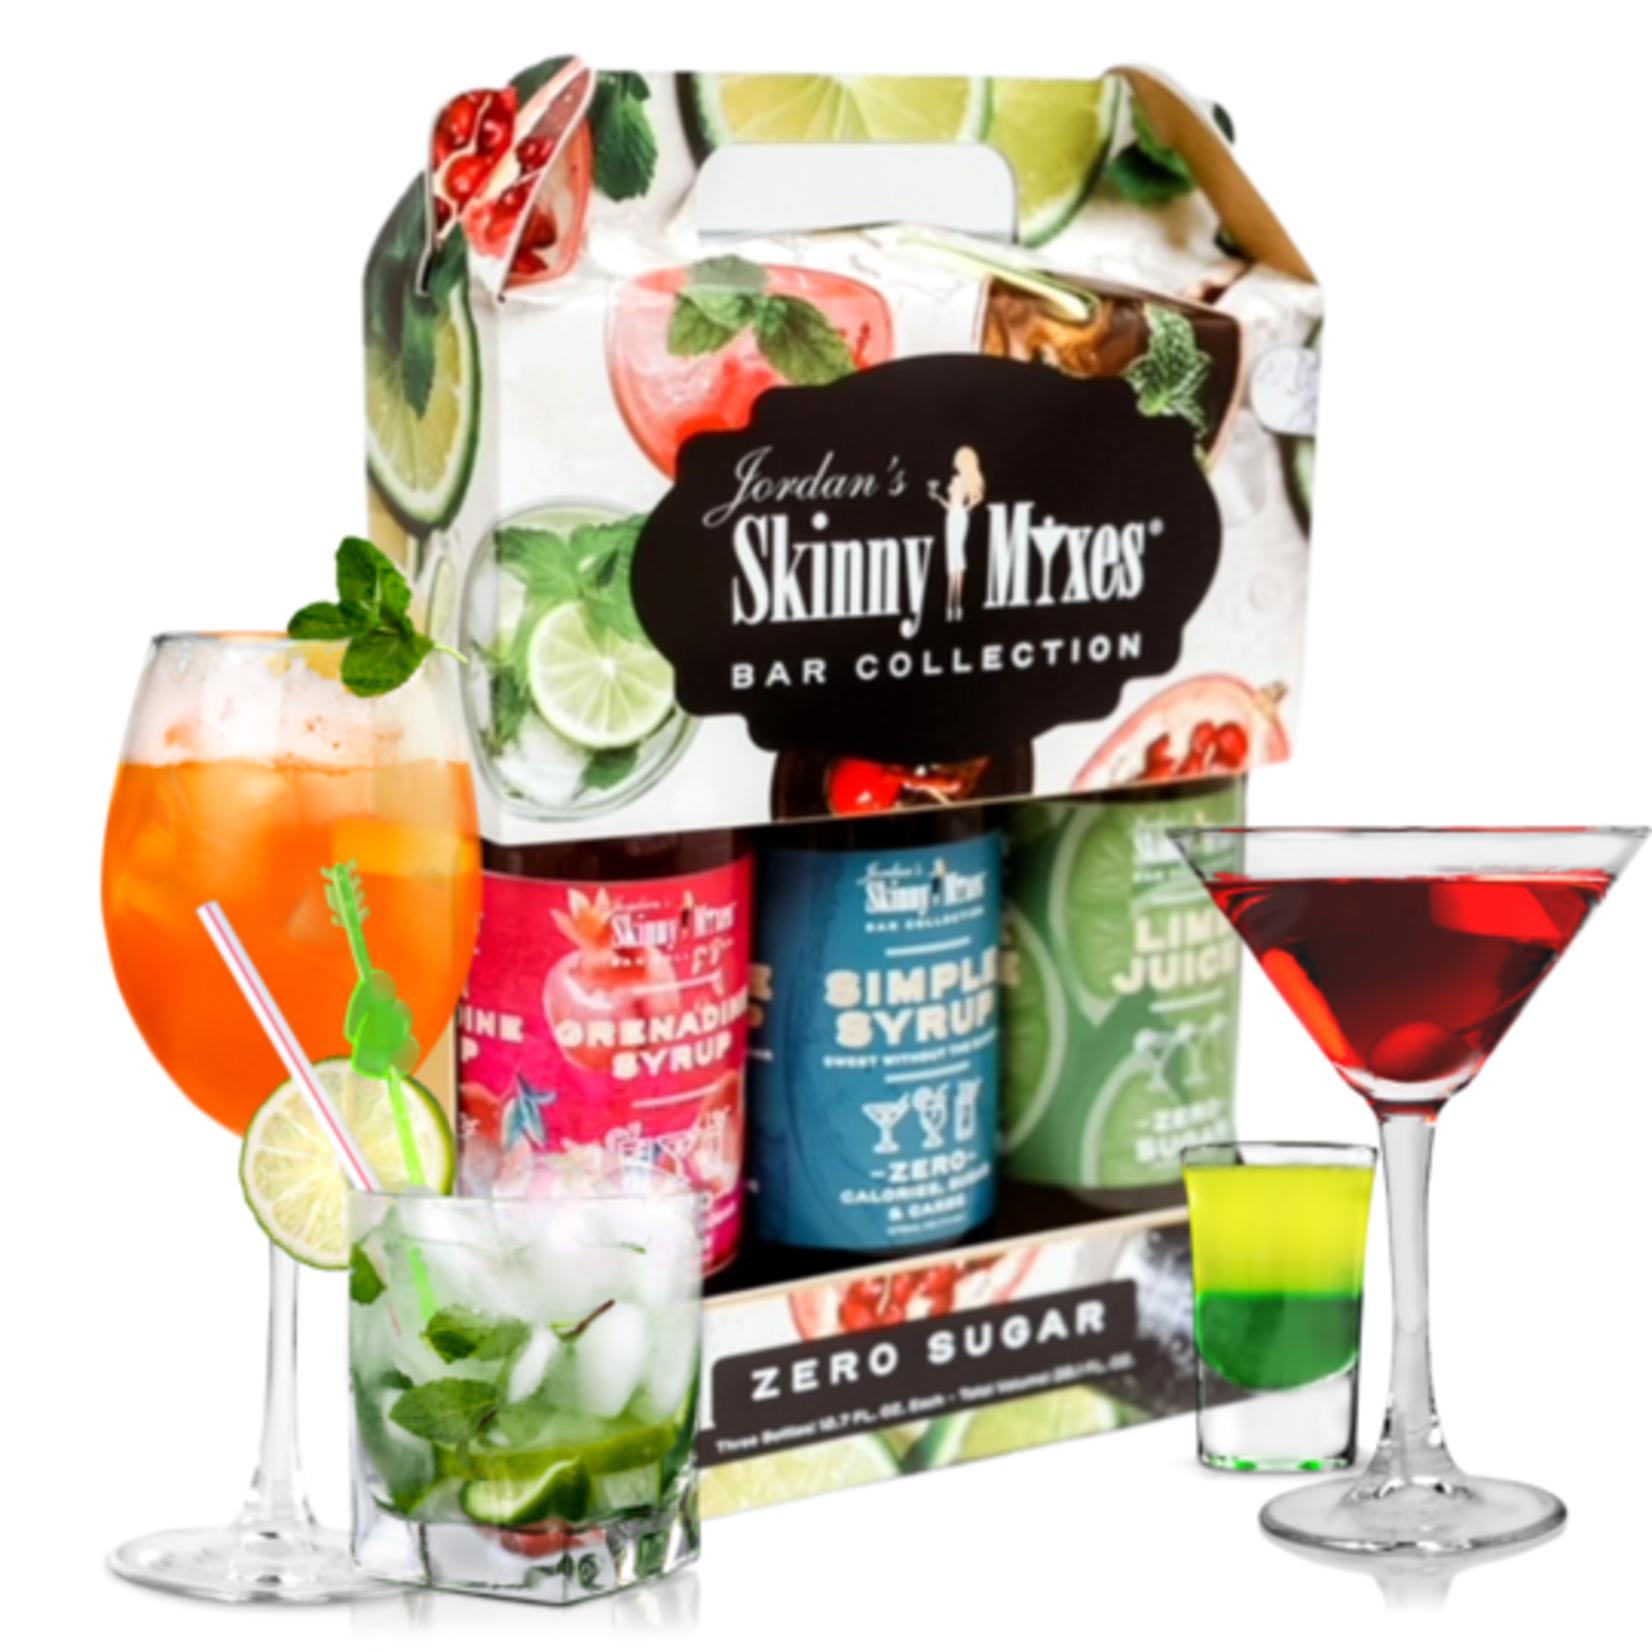 Jordan's Skinny Mixes Bar Collection Trio